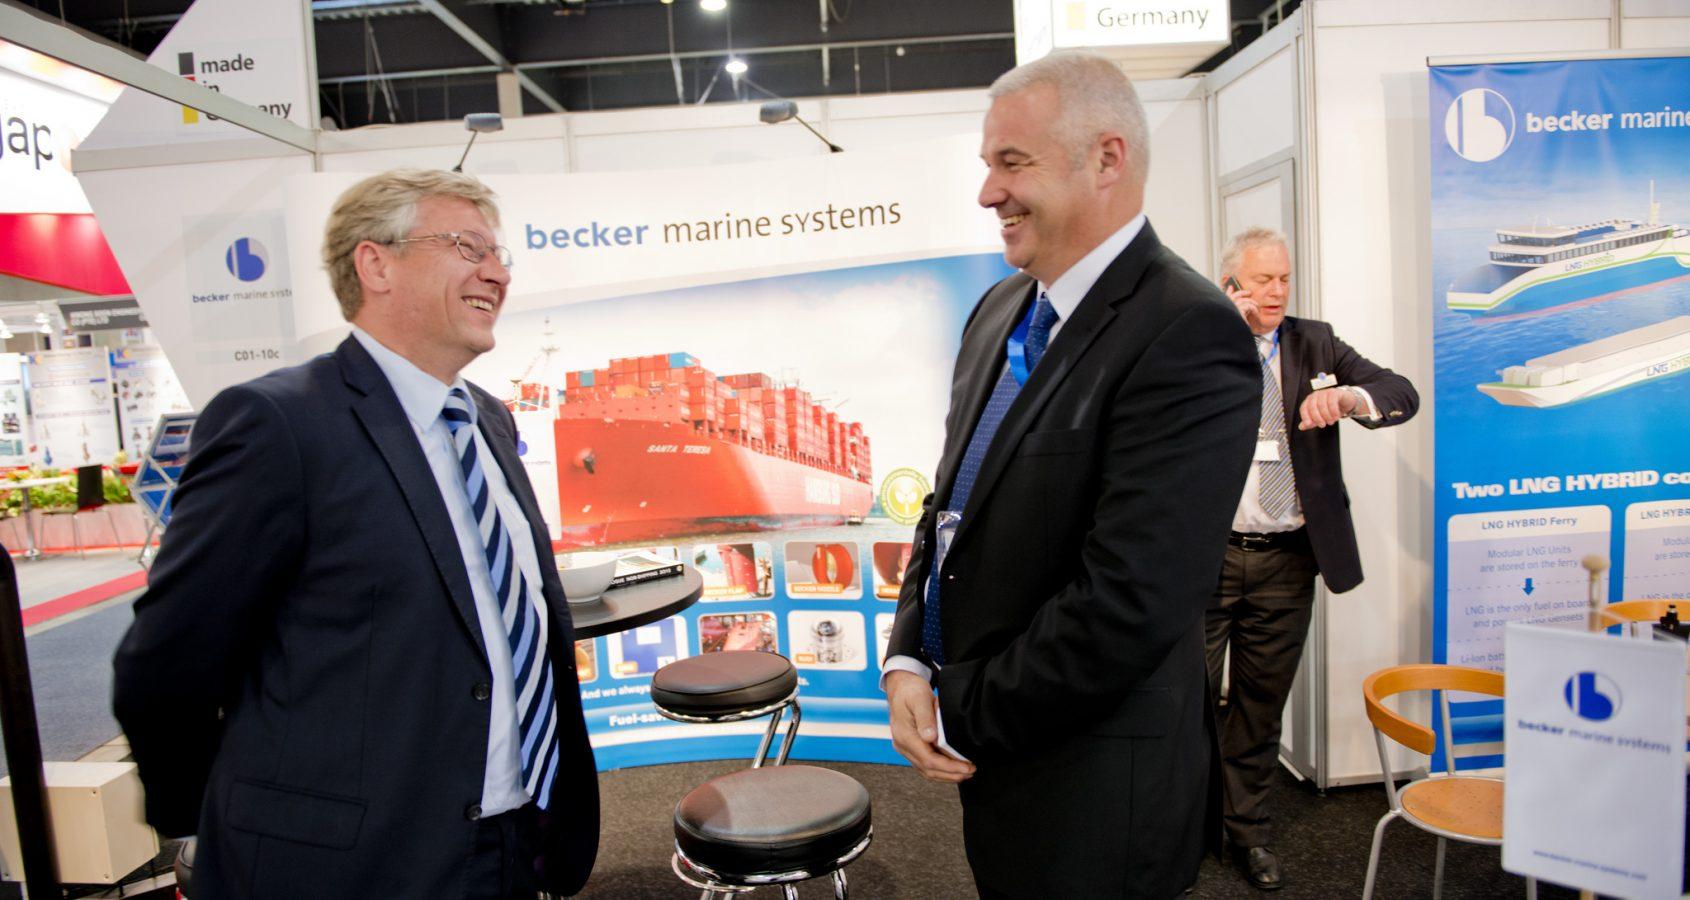 Stand des Unternehmens Becker Maritime Systems beim deutschen Pavillon der Nor-Shipping 2015©Nor Shipping